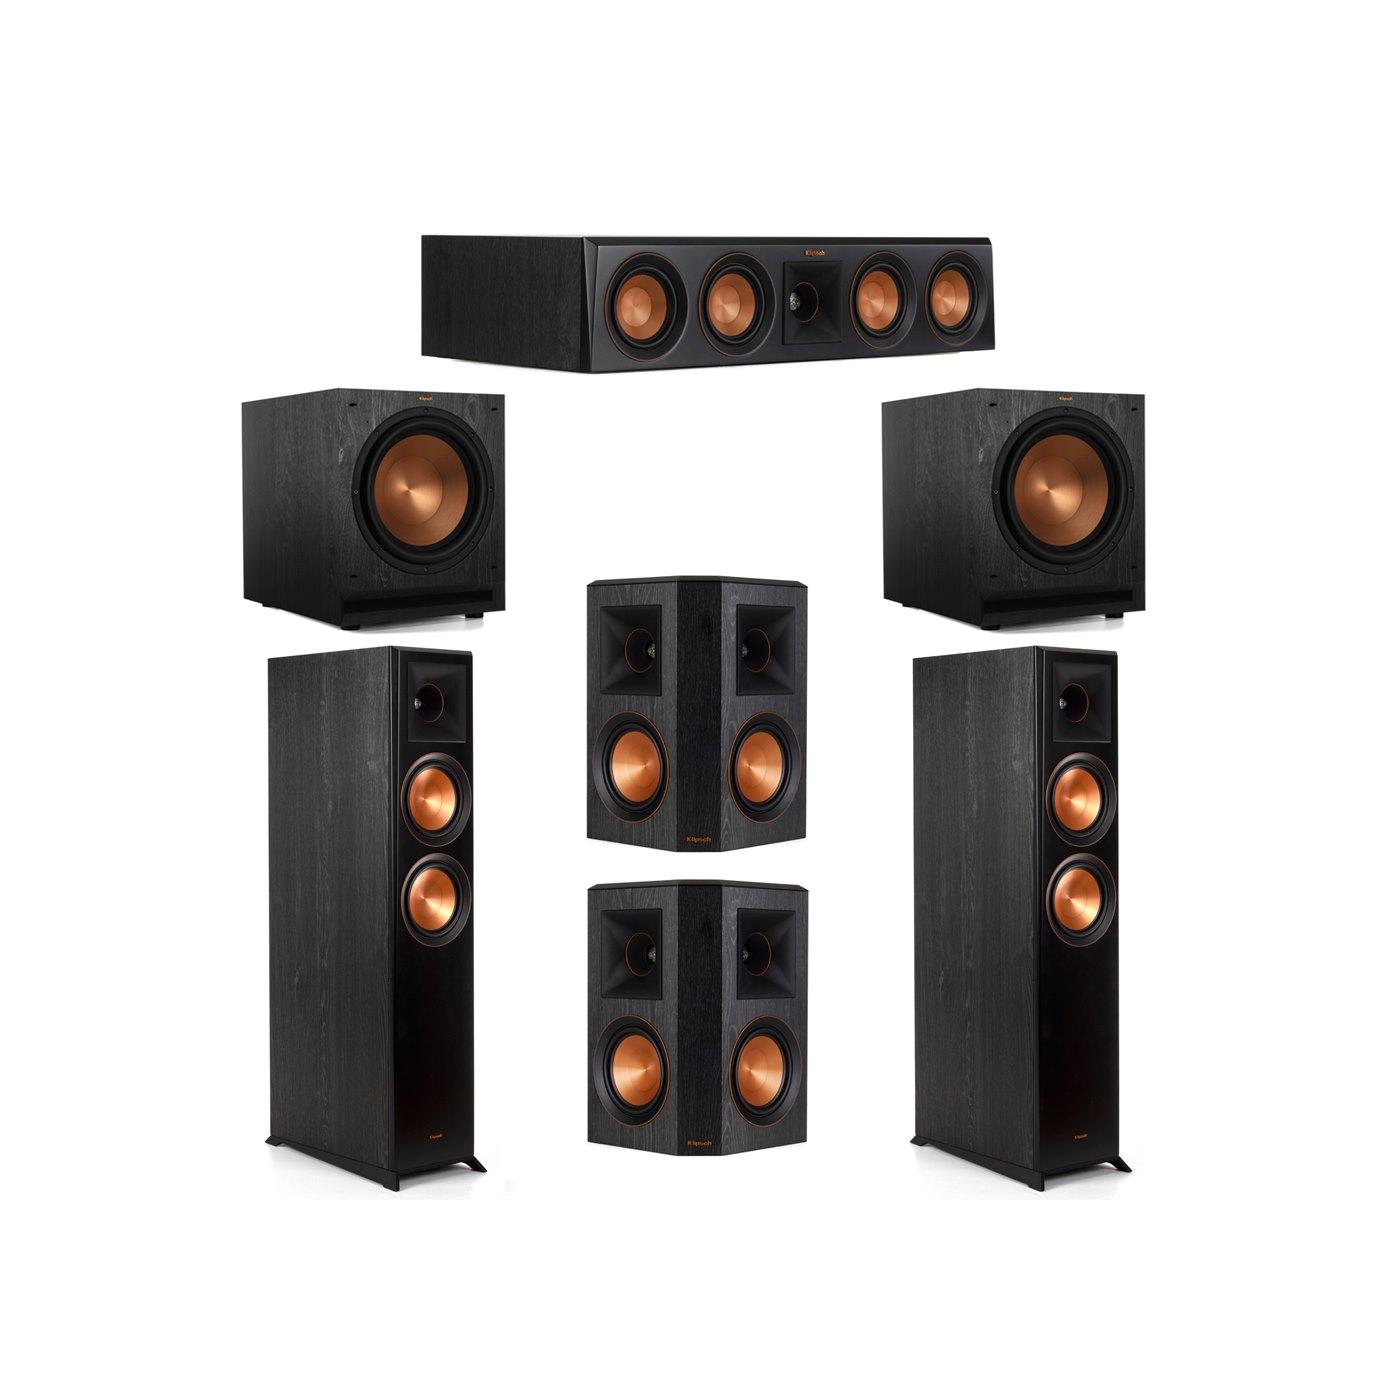 Klipsch 5.2 System with 2 RP-6000F Floorstanding Speakers, 1 Klipsch RP-404C Center Speaker, 2 Klipsch RP-502S Surround Speakers, 2 Klipsch SPL-120 Subwoofers